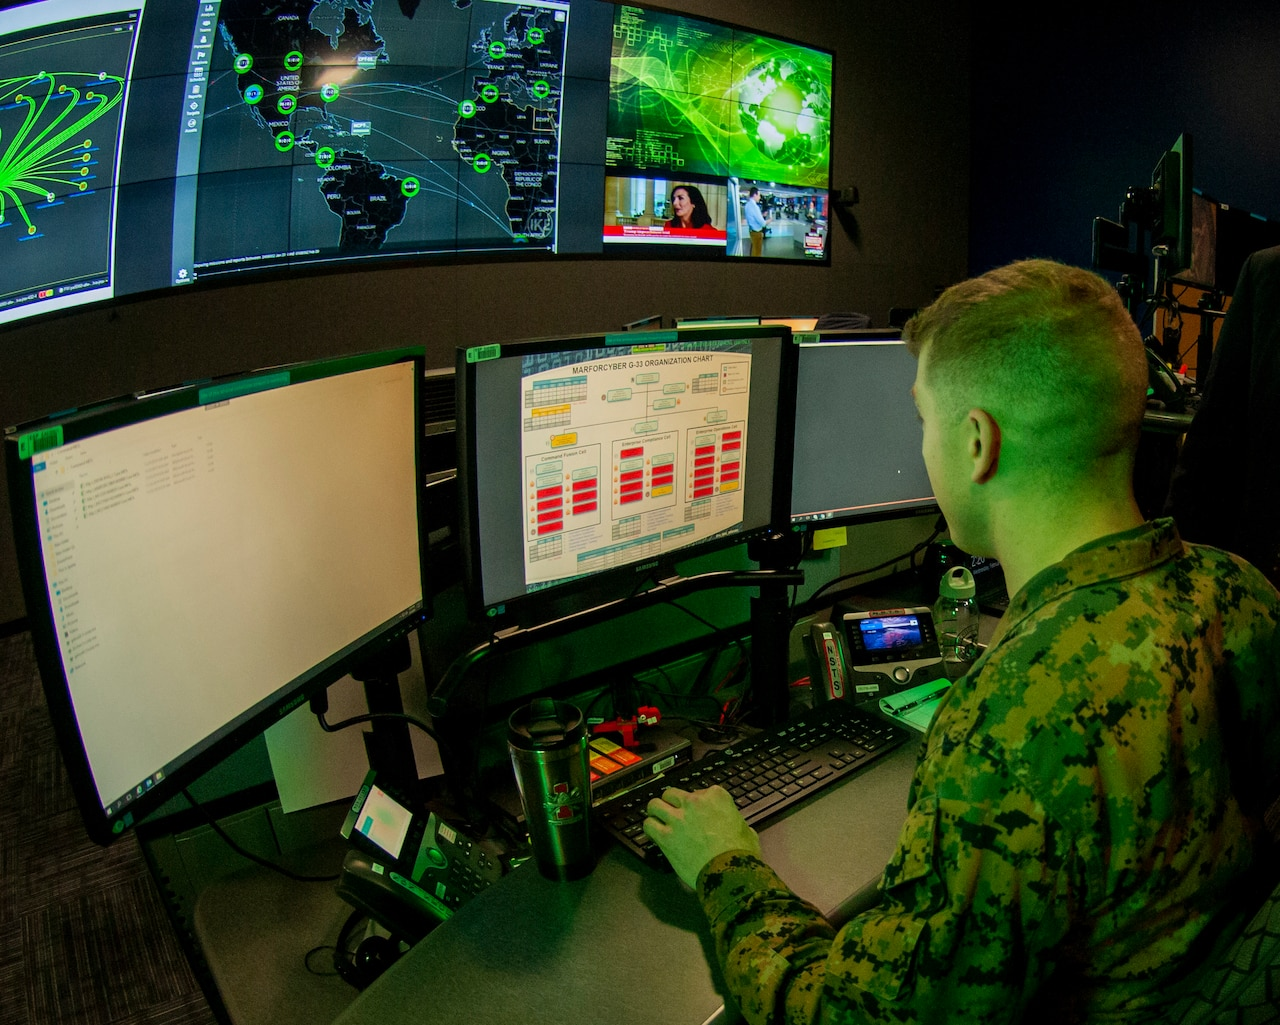 A Marine operates a computer.